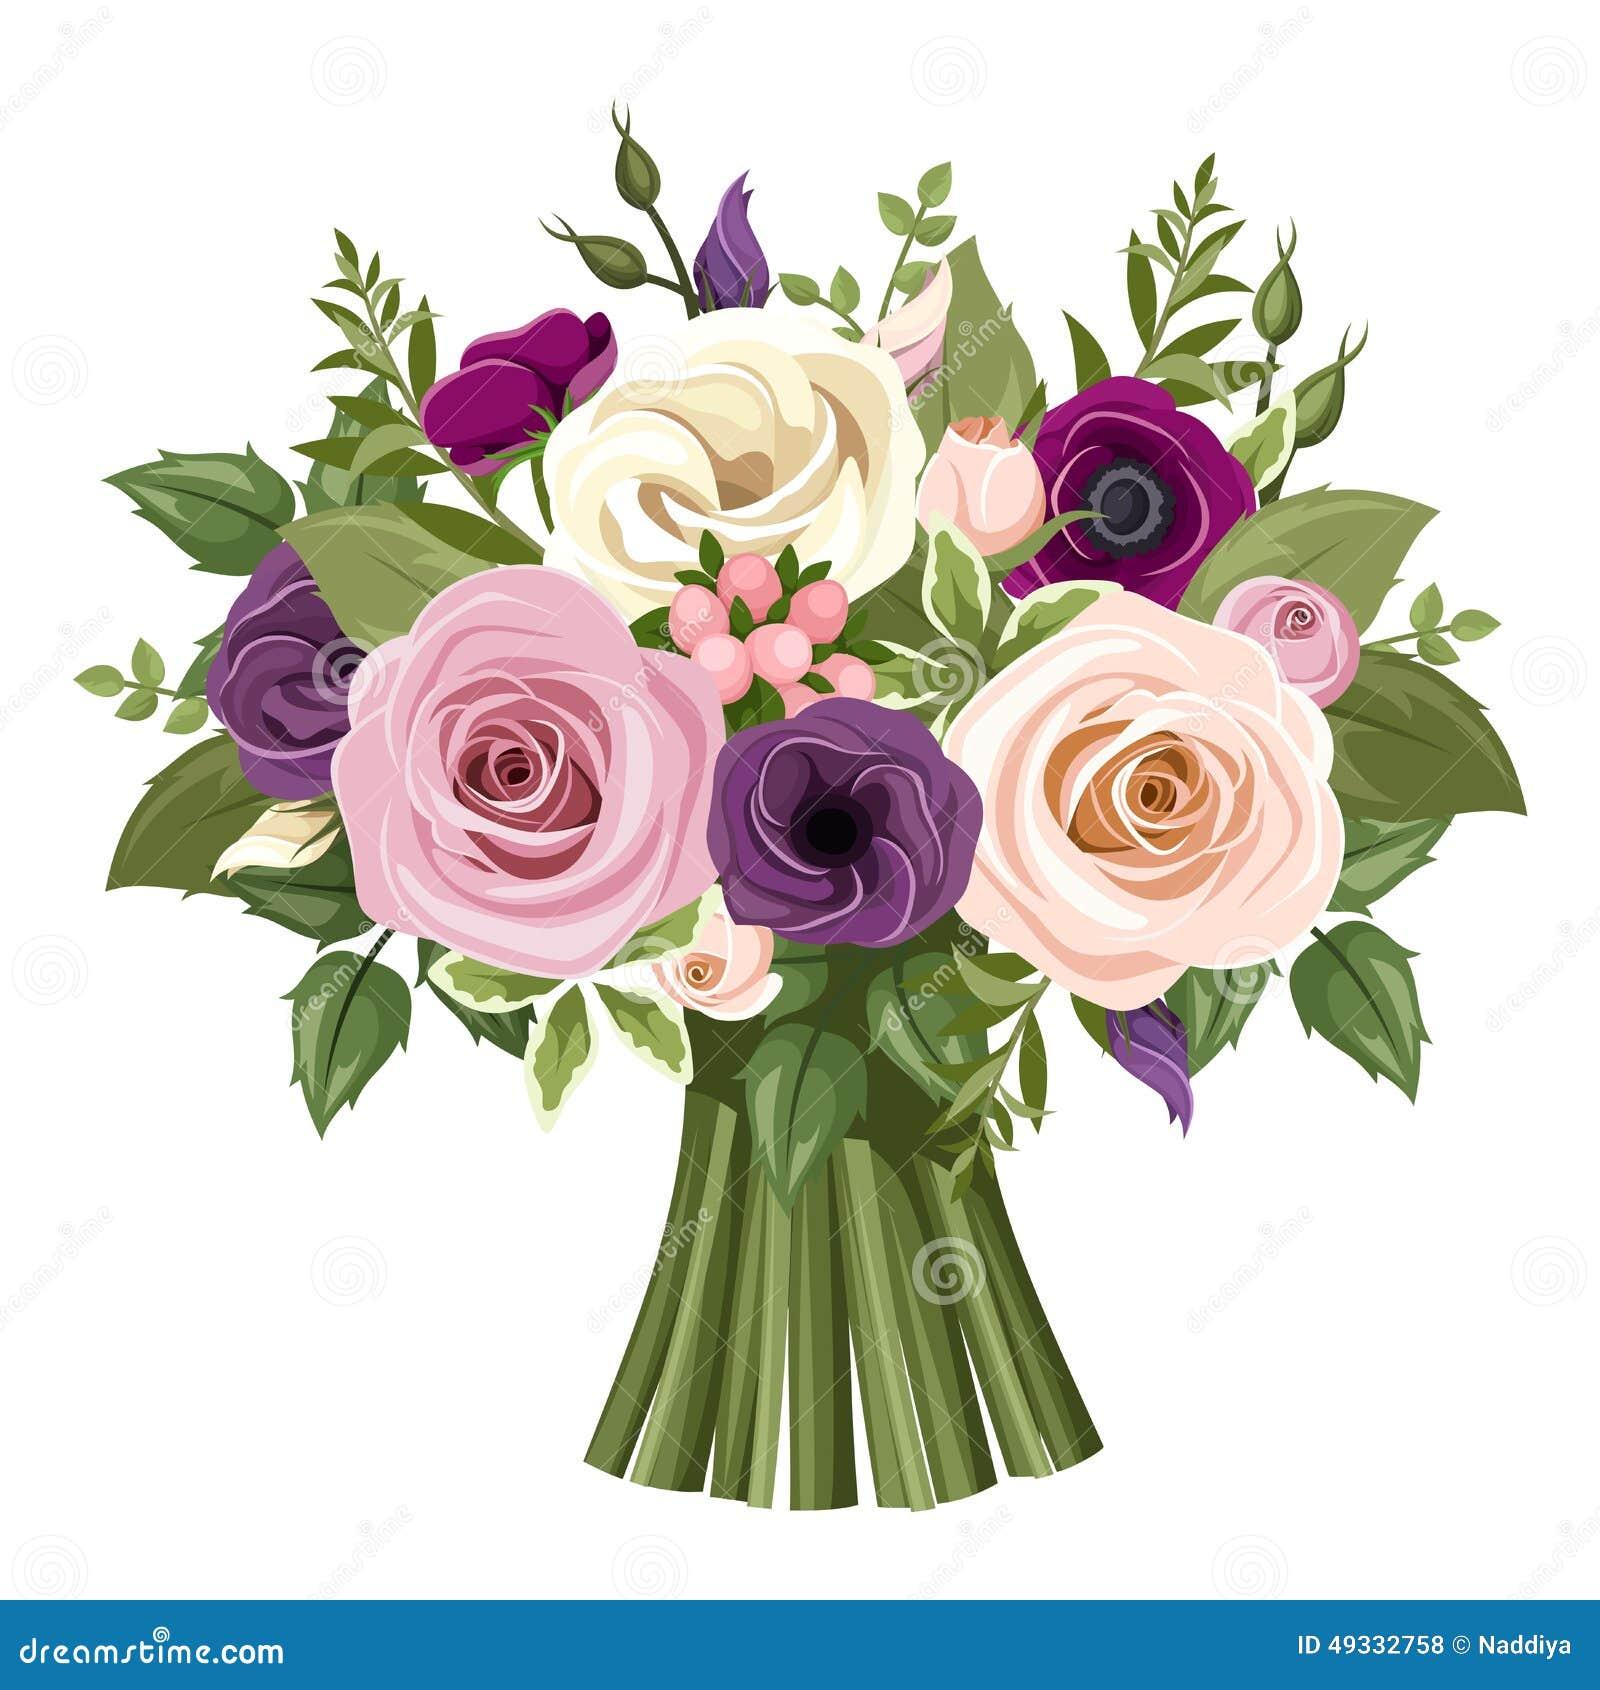 Bouquet of colorful roses and lisianthus flowers vector download bouquet of colorful roses and lisianthus flowers vector illustration stock vector illustration altavistaventures Choice Image